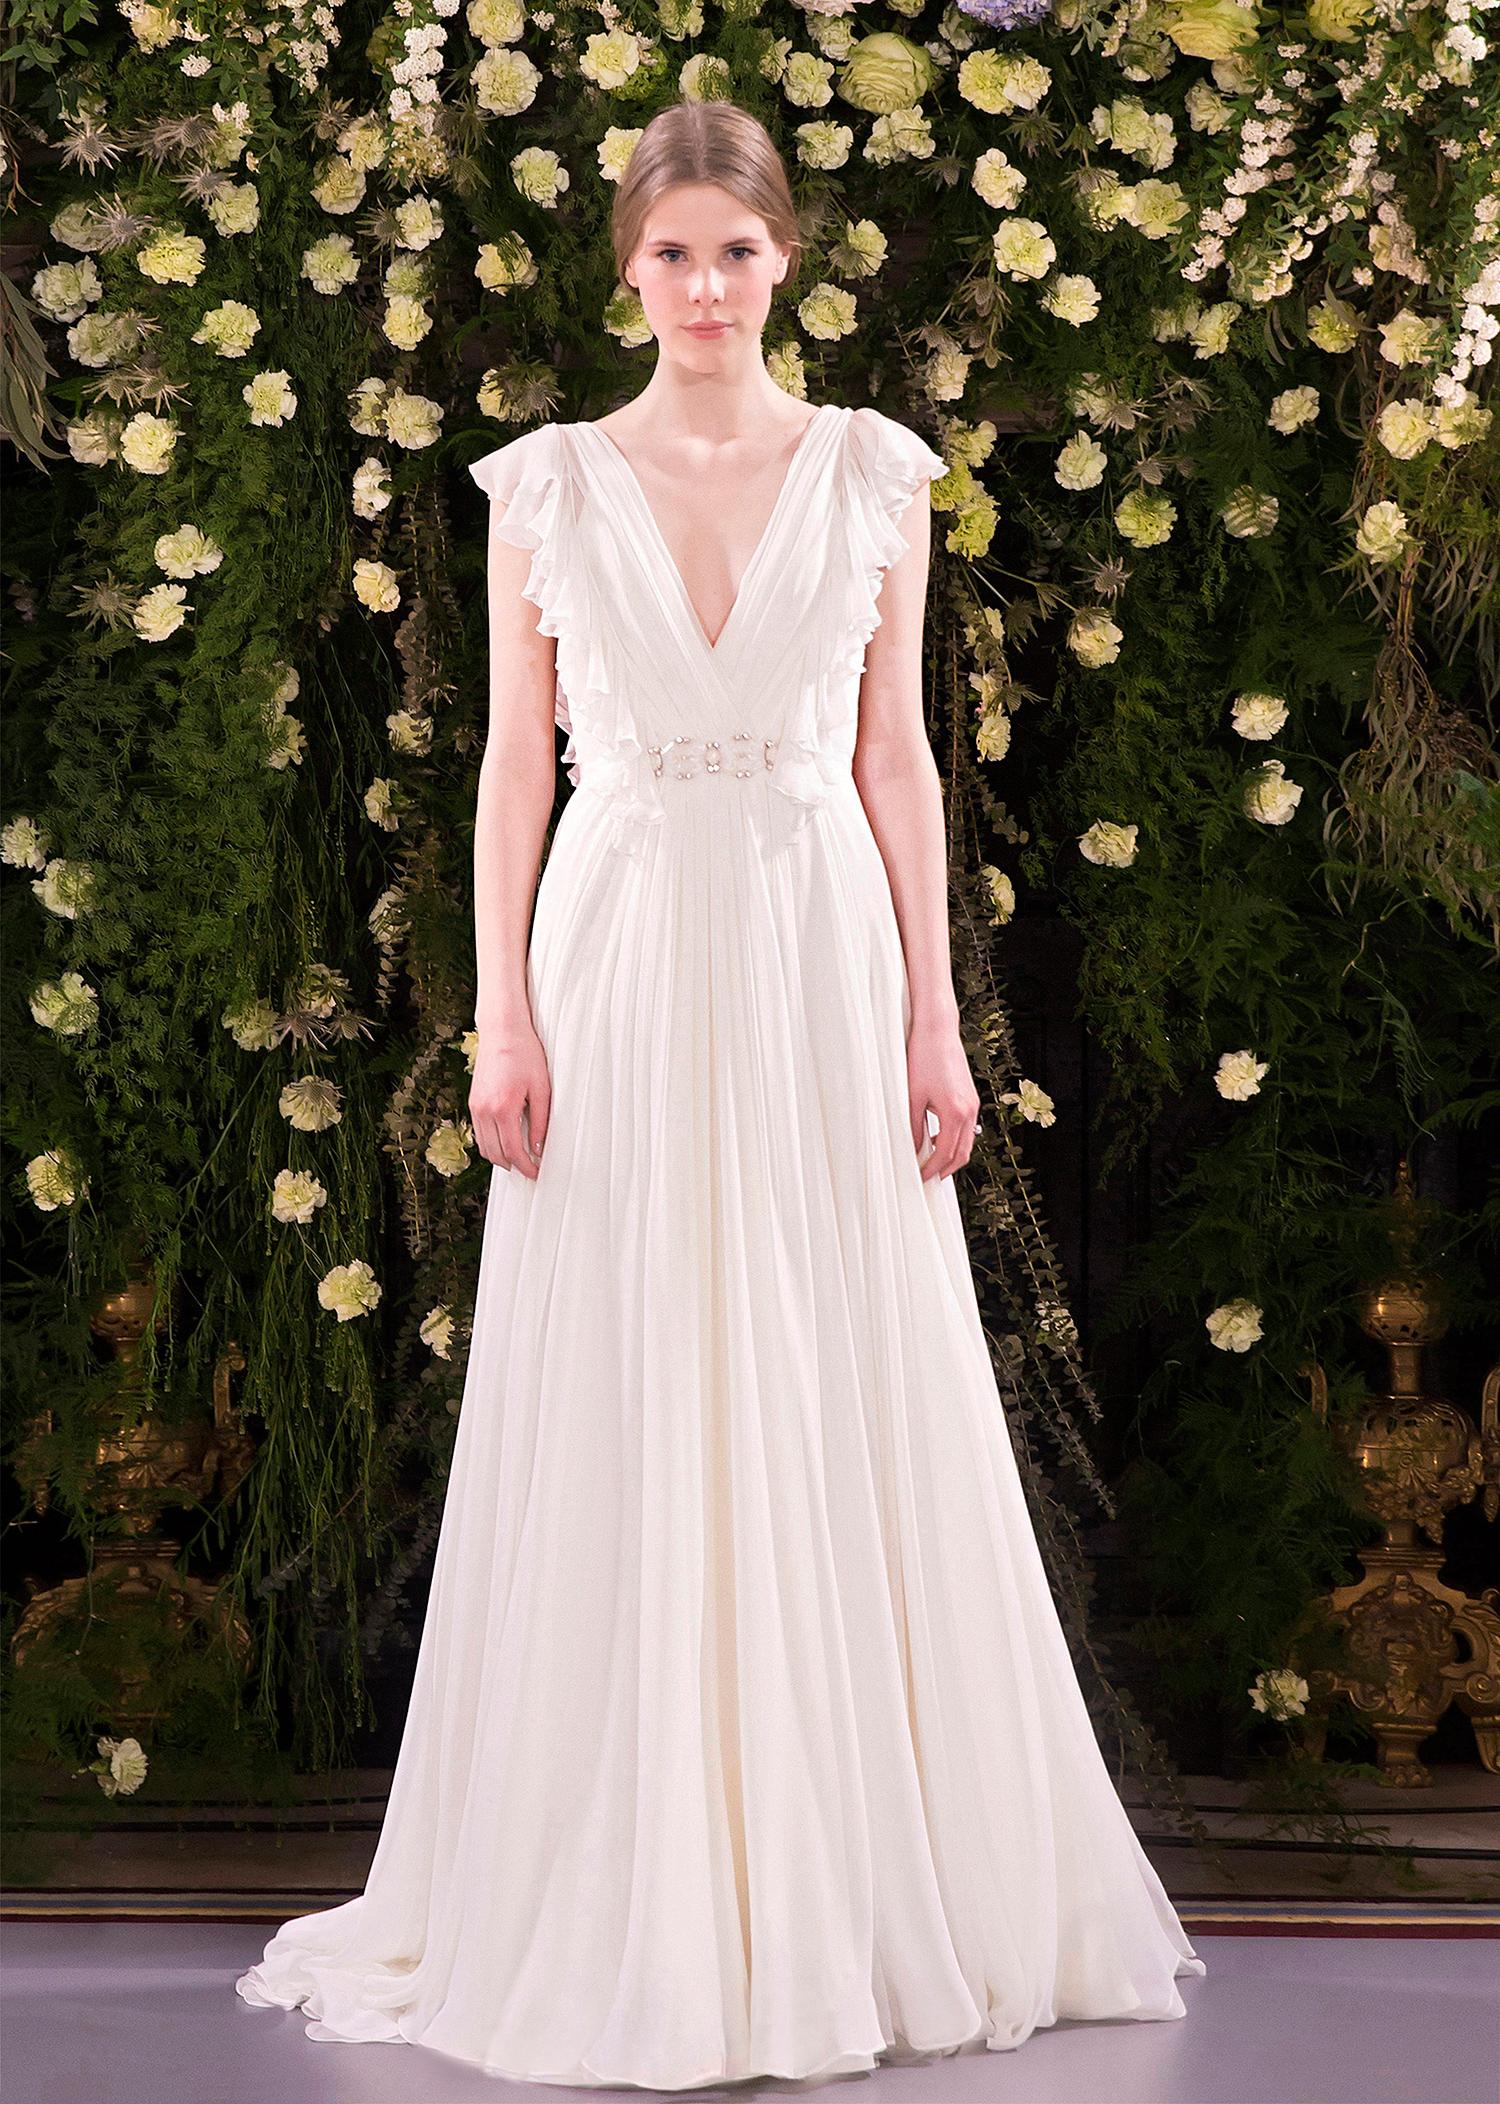 jenny packham wedding dress spring 2019 gathered v-neck with flutter sleeves